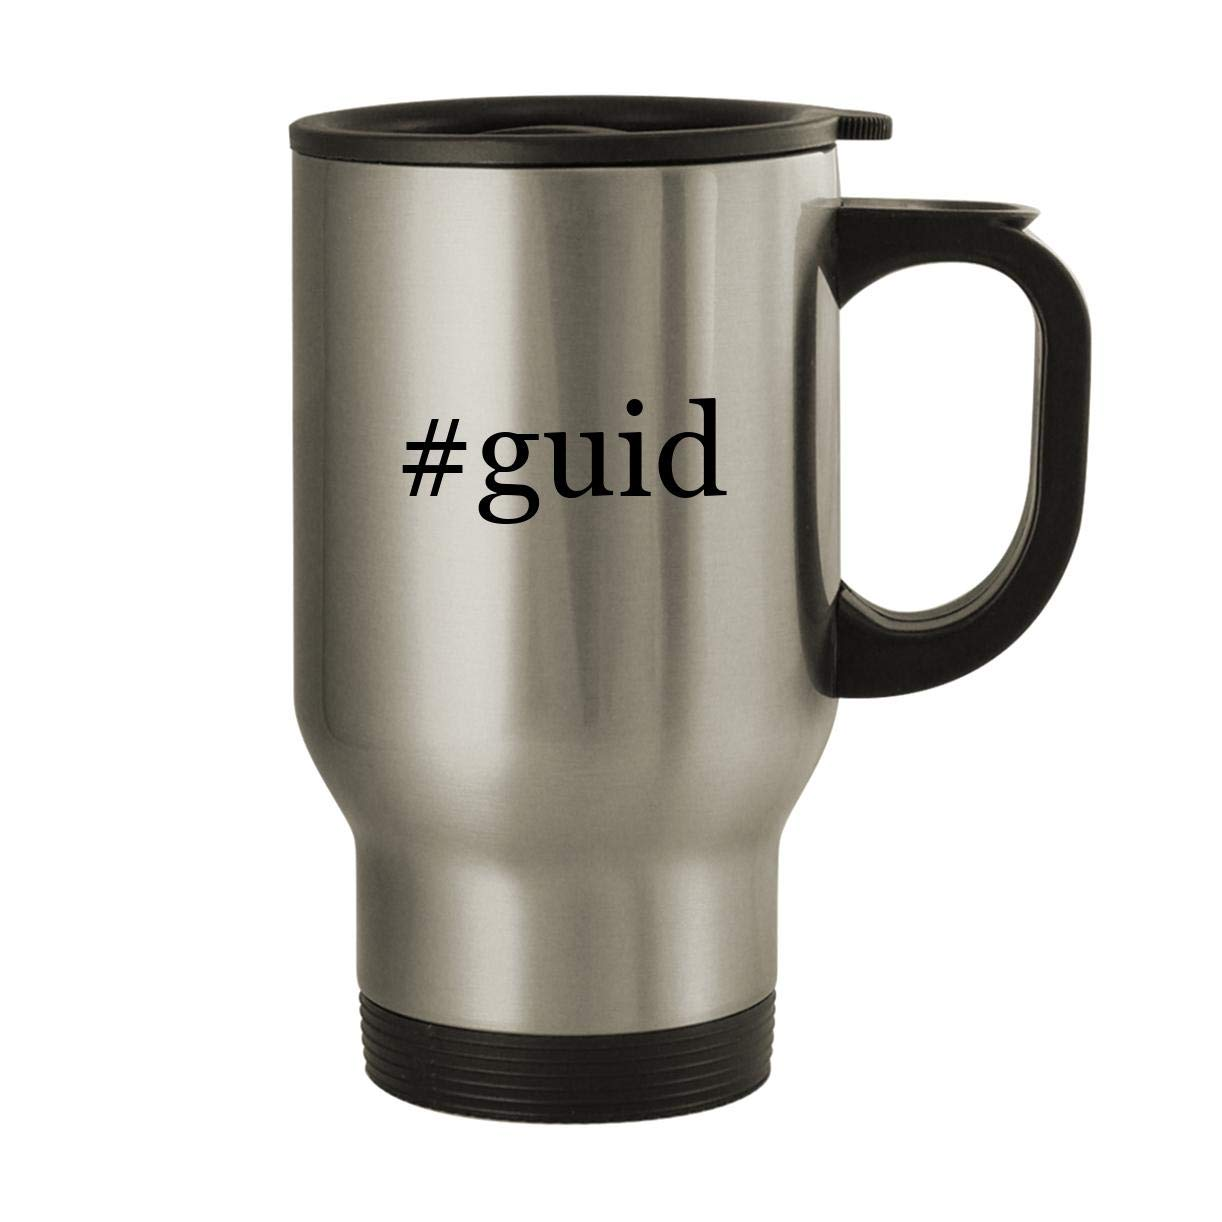 #guid - Stainless Steel Hashtag 14oz Travel Mug, Silver